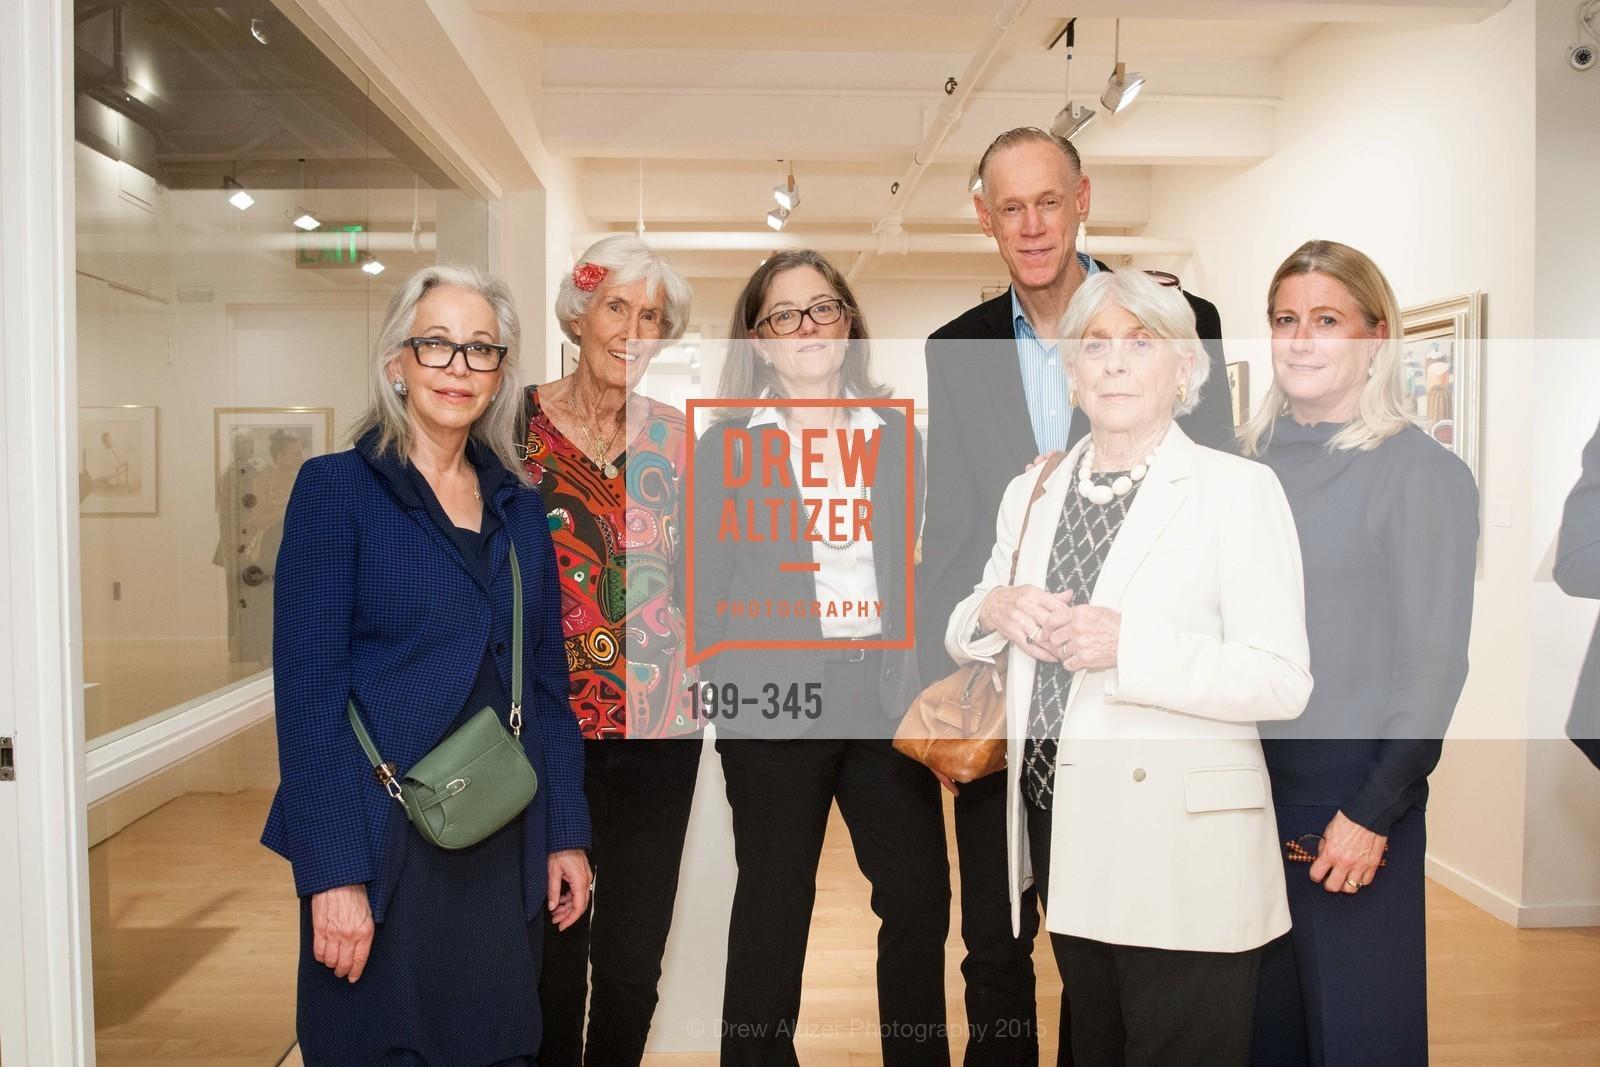 Nancy Ascher, Shirley Kelley, Elena Gates, Tom Kelley, Robin Gates, Cathy Brisbin, John Berggruen Gallery presents